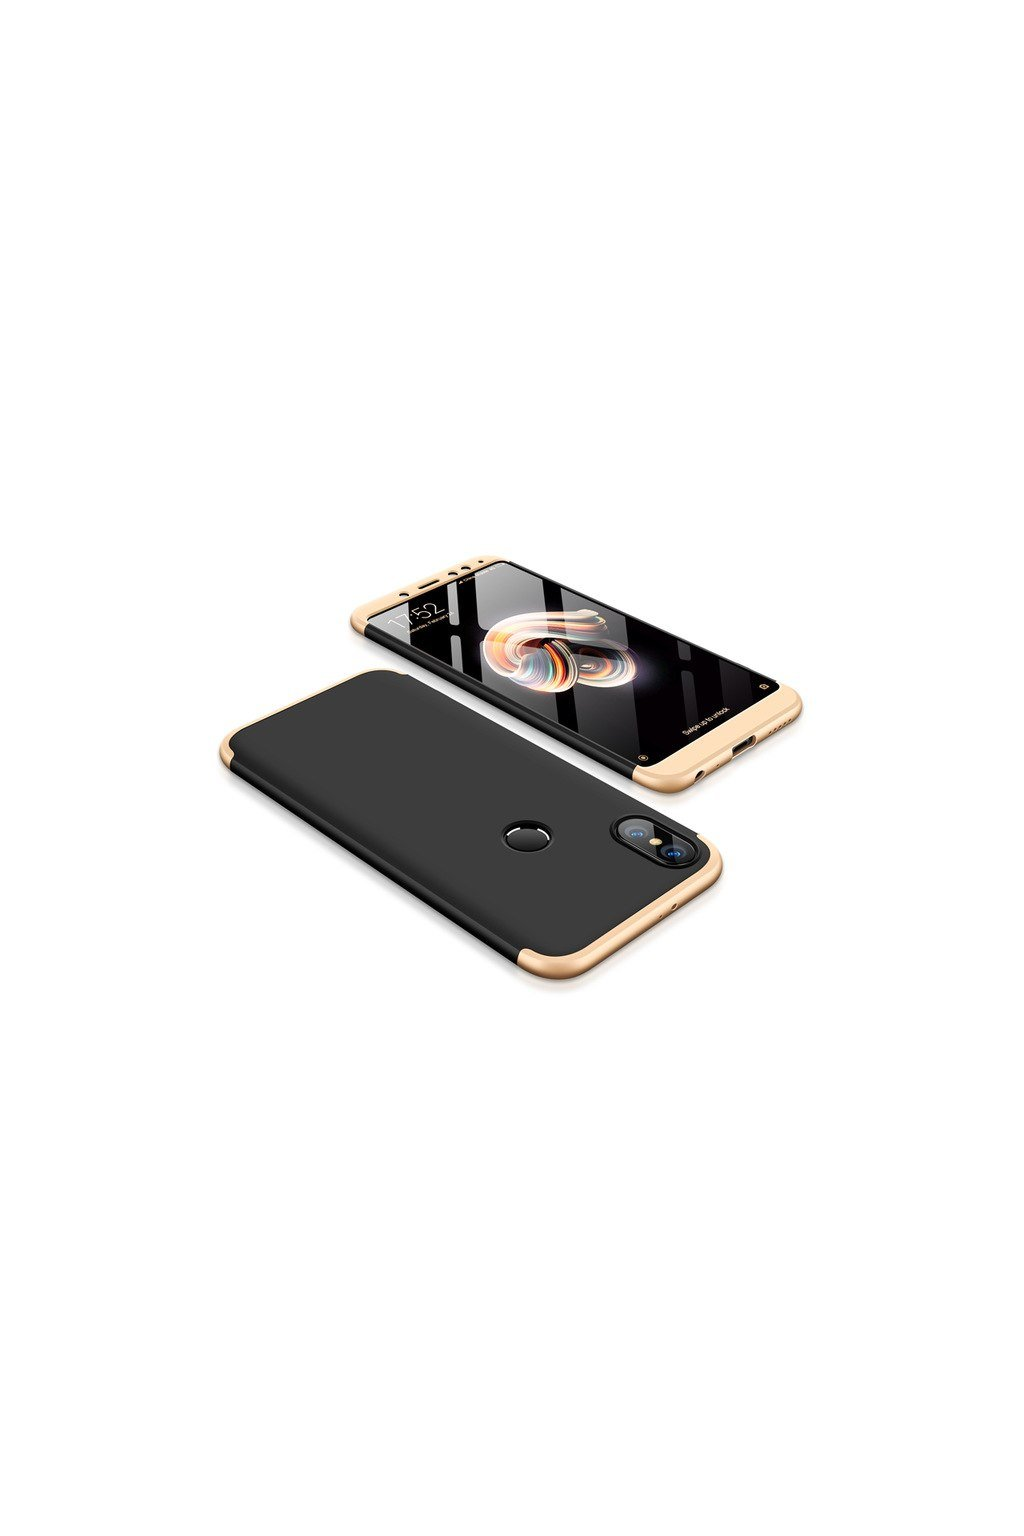 Case for Xiaomi Redmi note 5 pro Redmi note 5 Global Case 360 Full Protection Matte.jpg 640x640 (1)